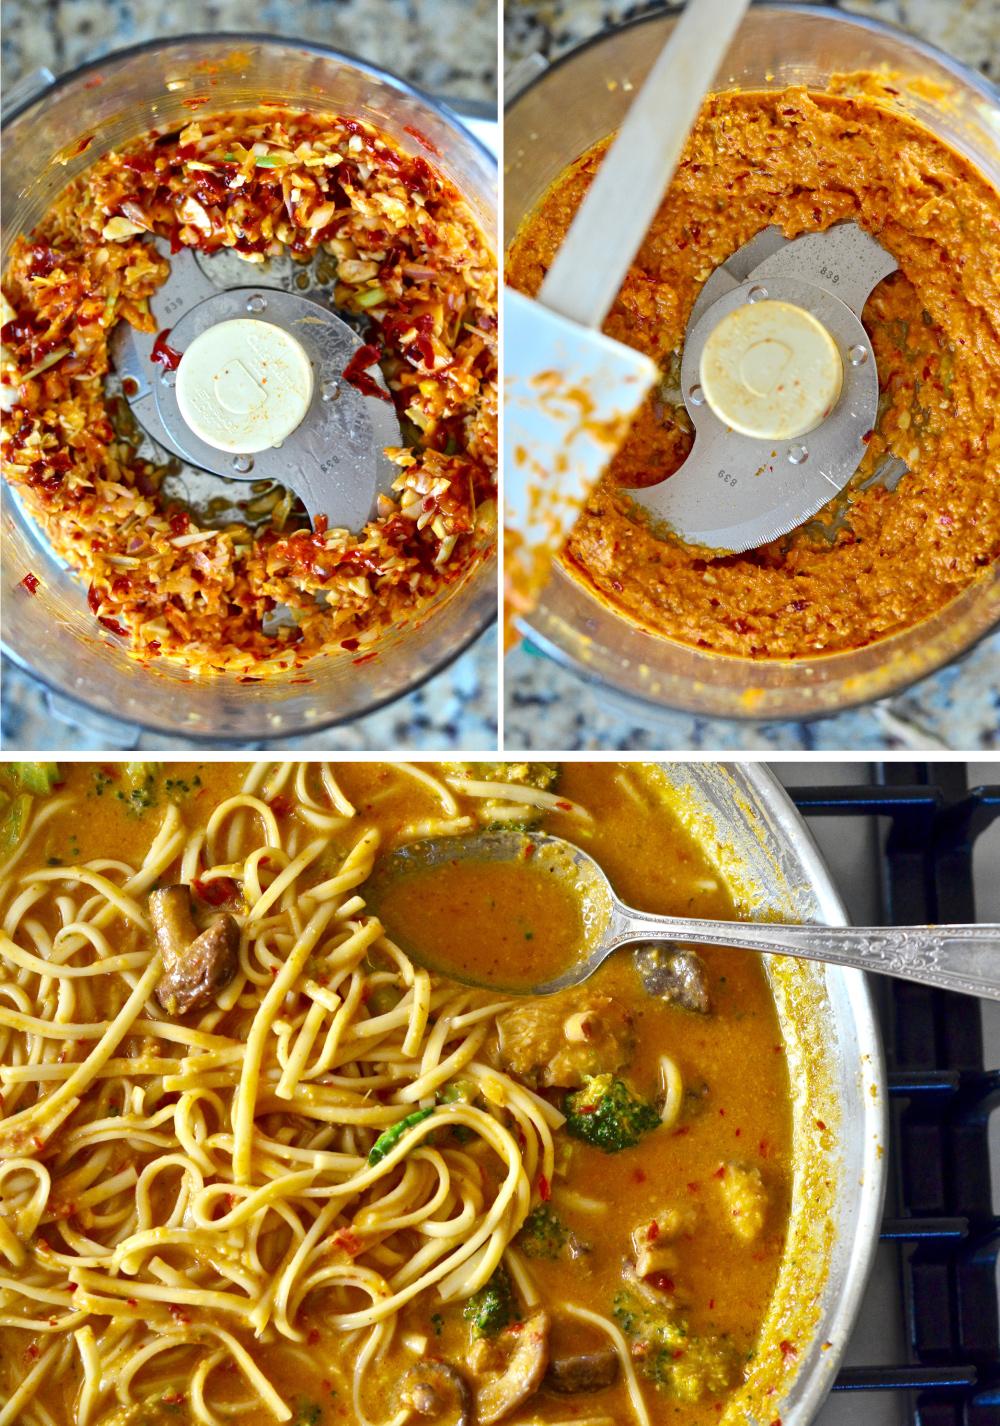 Homemade Vegetable Laksa Soup with Noodles. Recipe via @PureMamas   gluten-free vegan